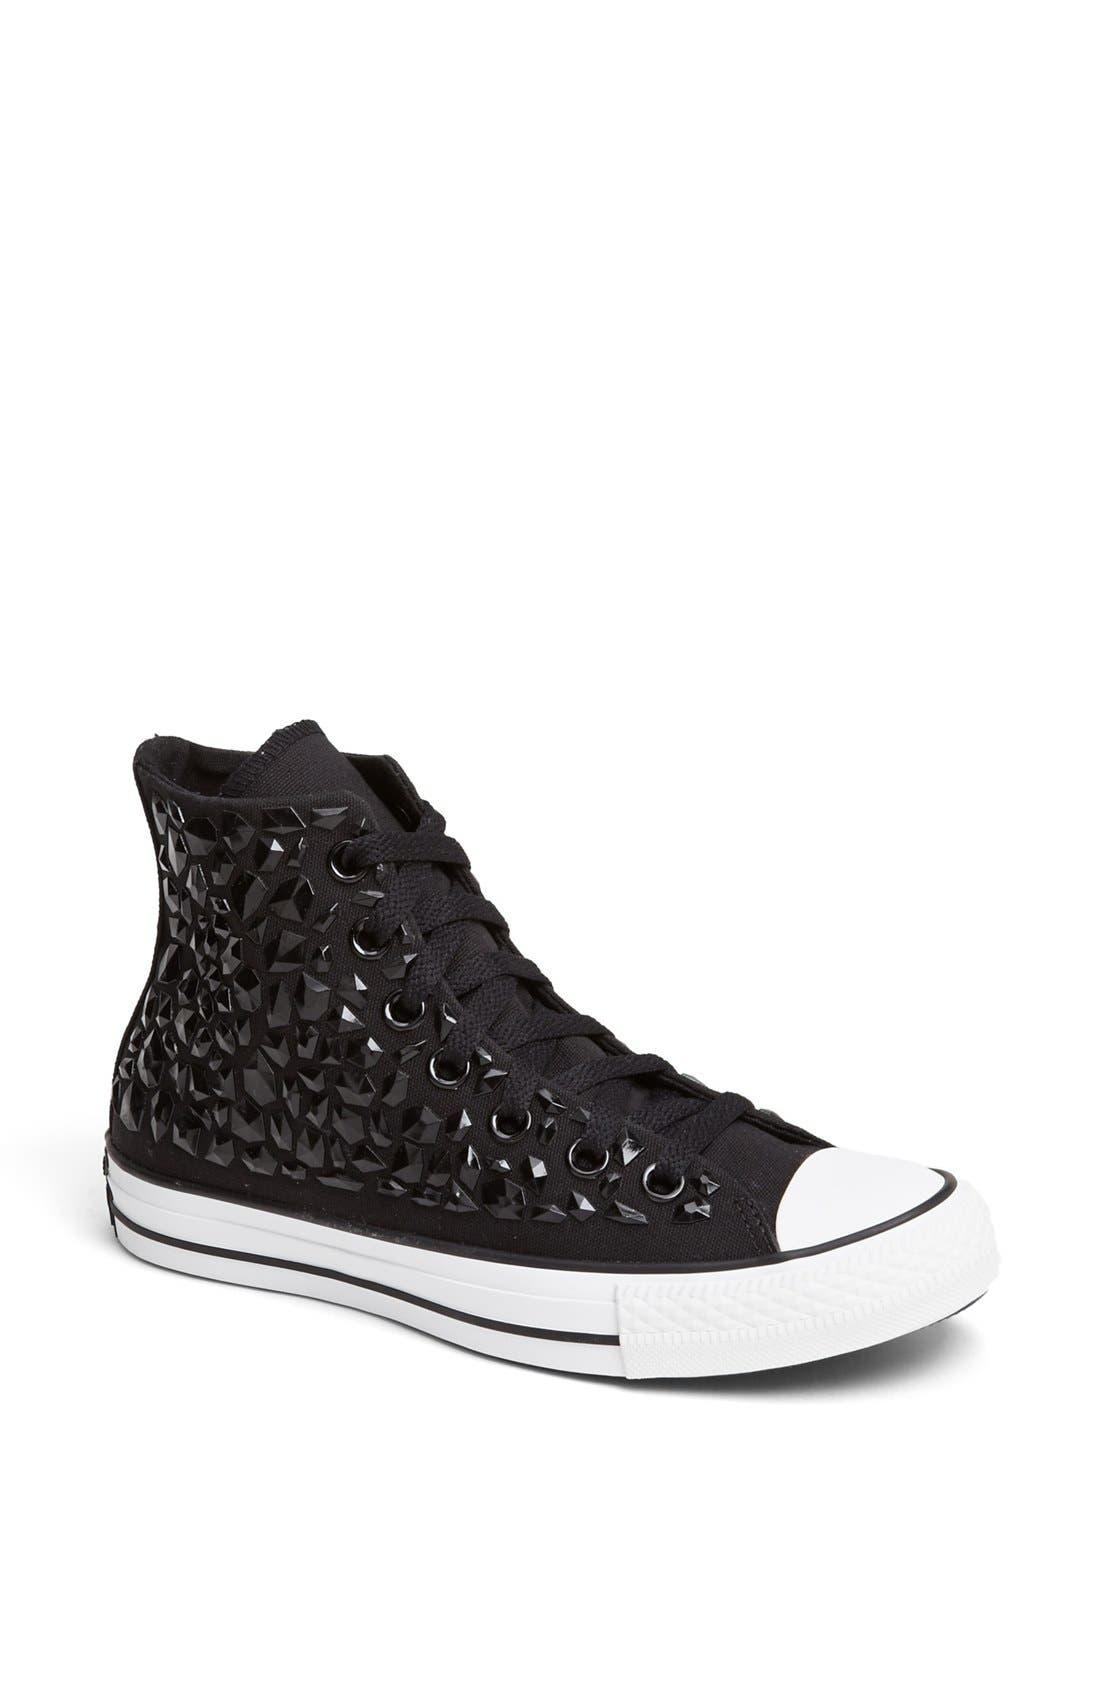 Main Image - Converse Chuck Taylor® All Star® 'Rhinestone' High Top Sneaker (Women)